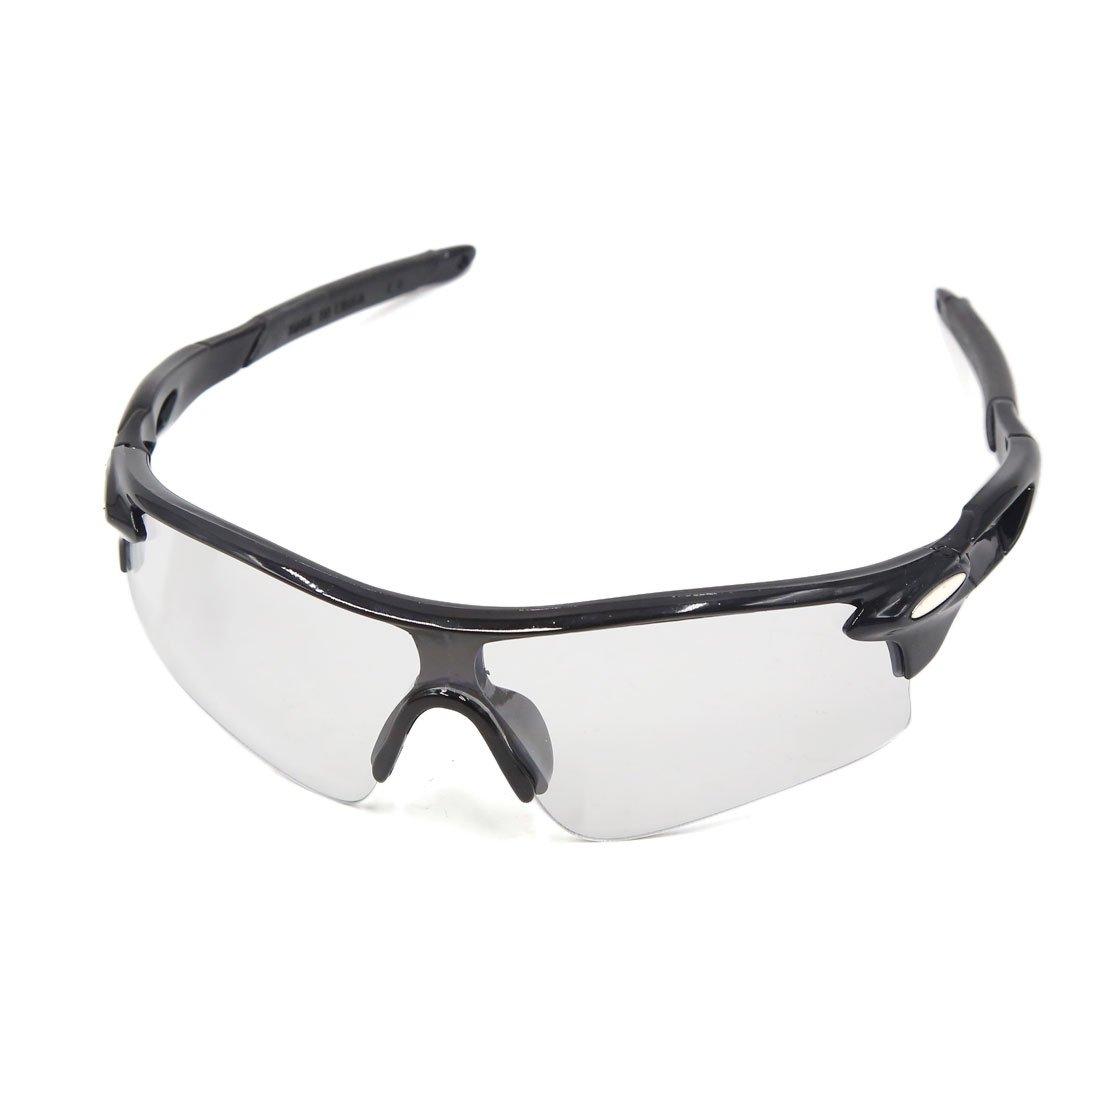 sourcingmap Medio Marco Negro Gafas de Ciclista Bicicleta MTB Lente Transparente a17021700ux0933